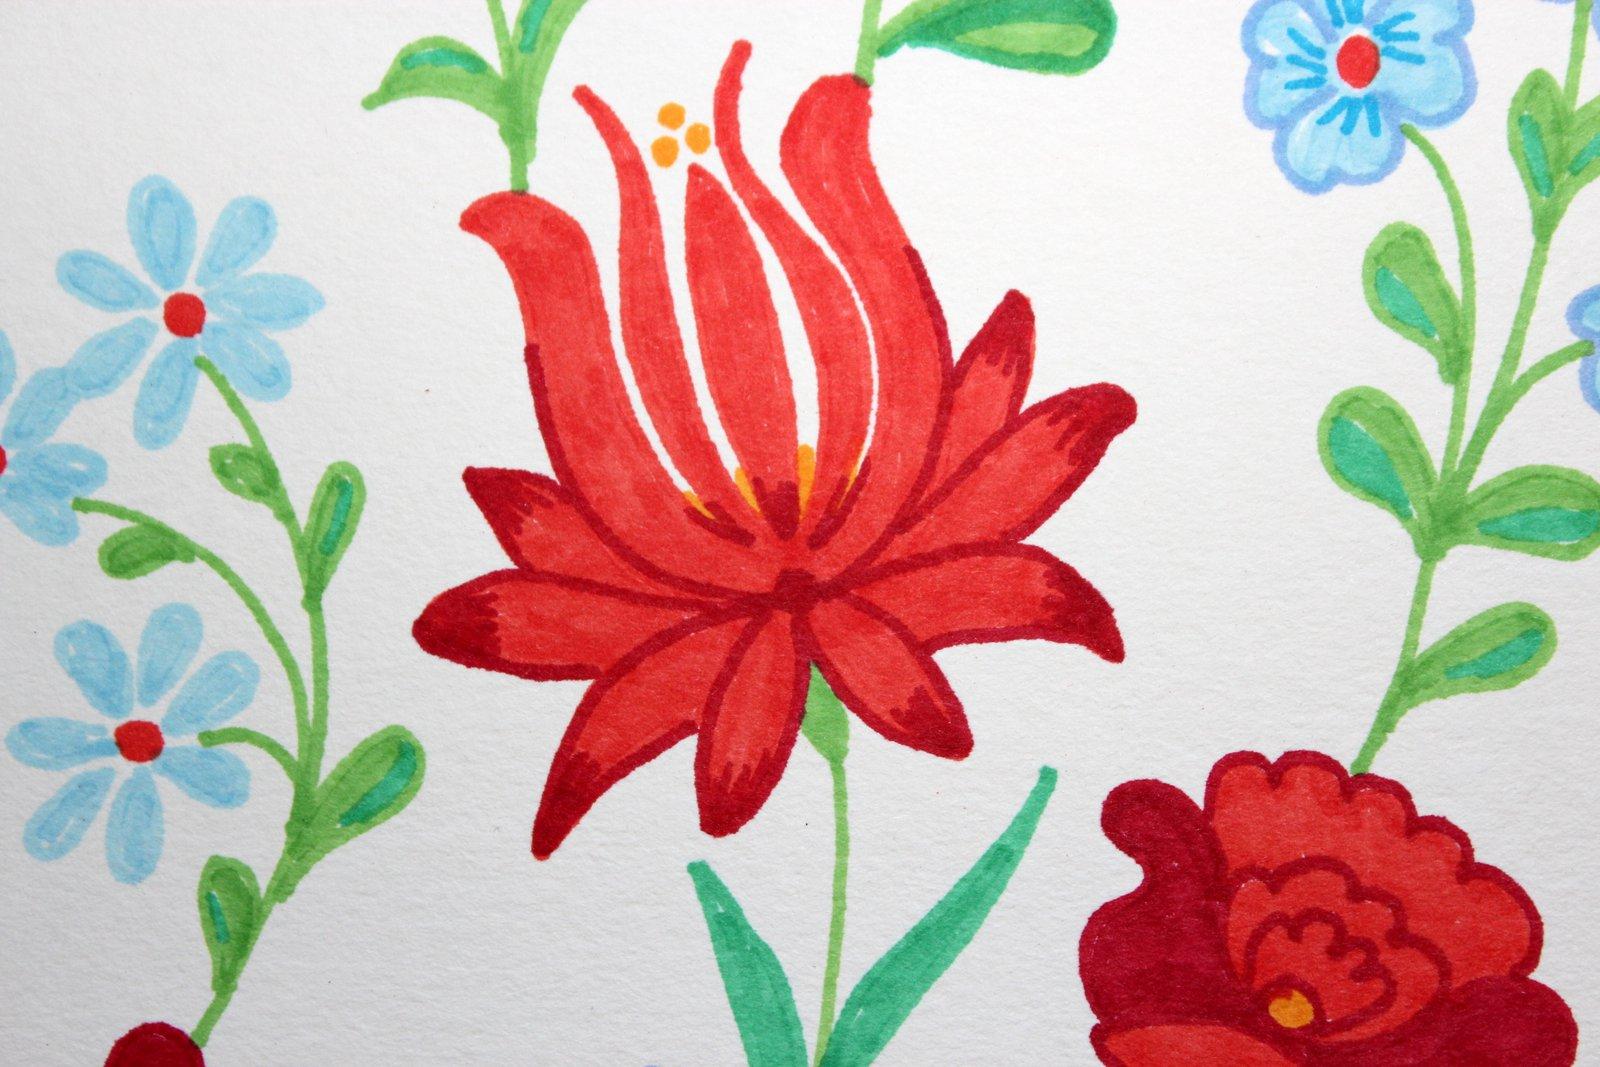 Rita Barton: Hungarian Flowers